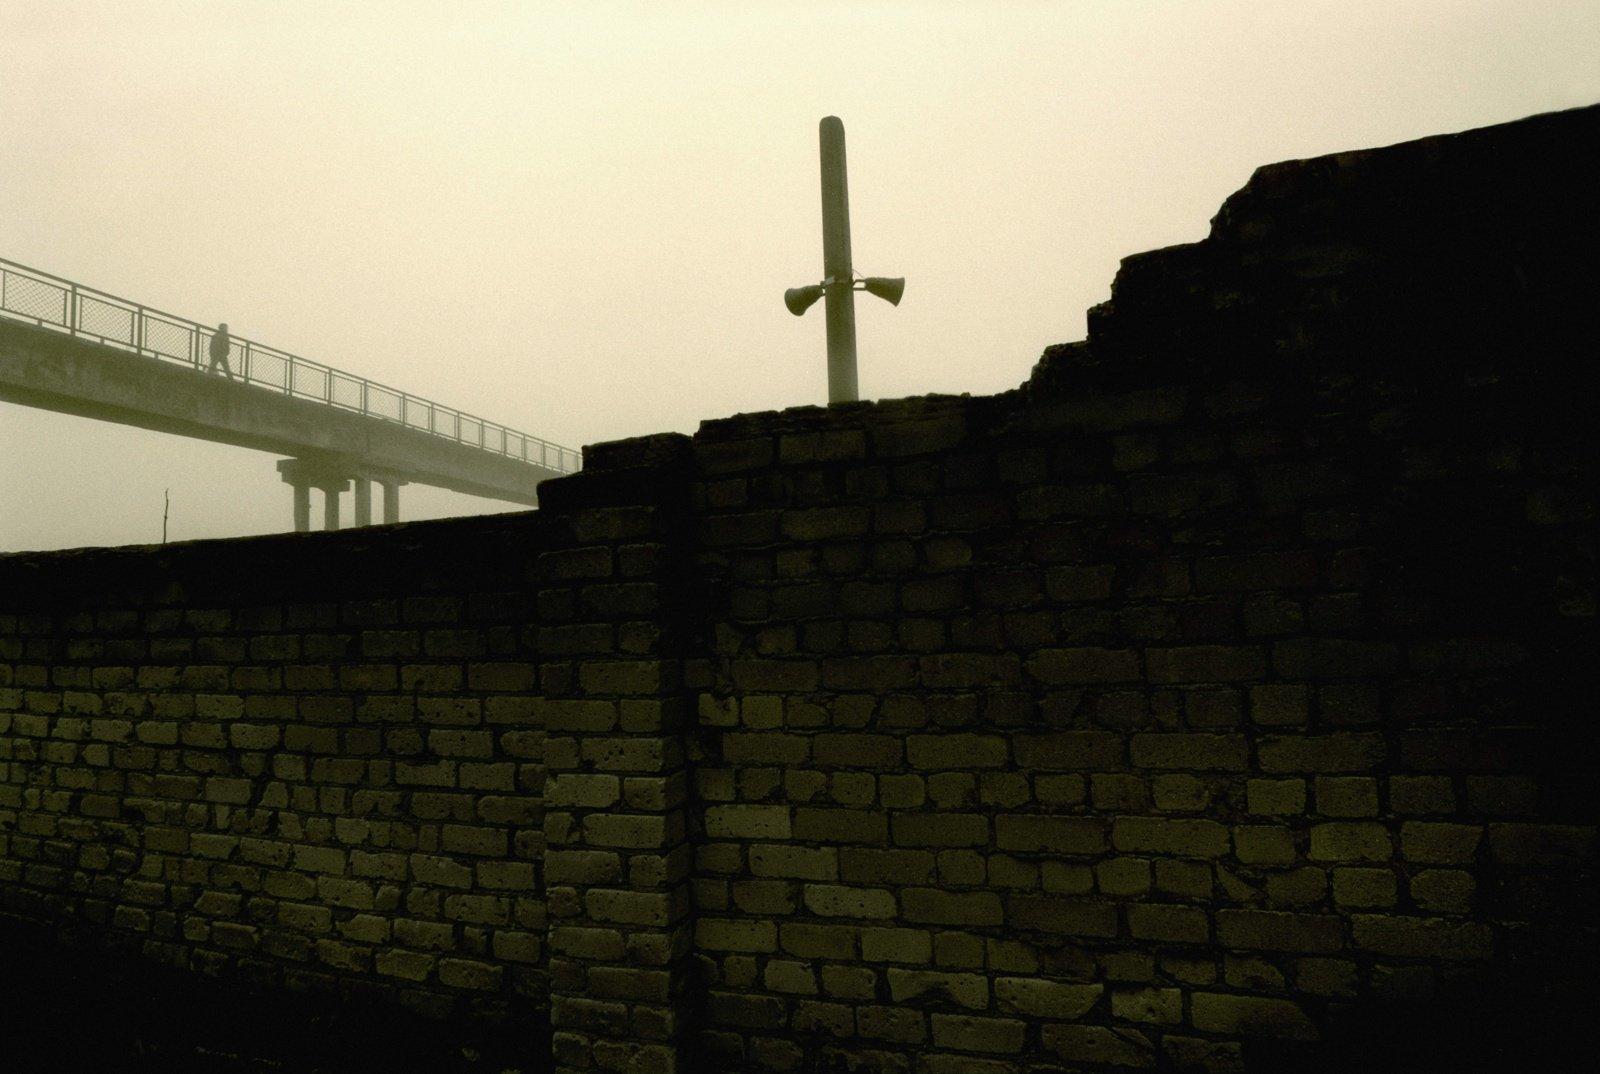 Fotografijos muziejuje – net dvi fotomenininko Aleksandro Ostašenkovo parodos